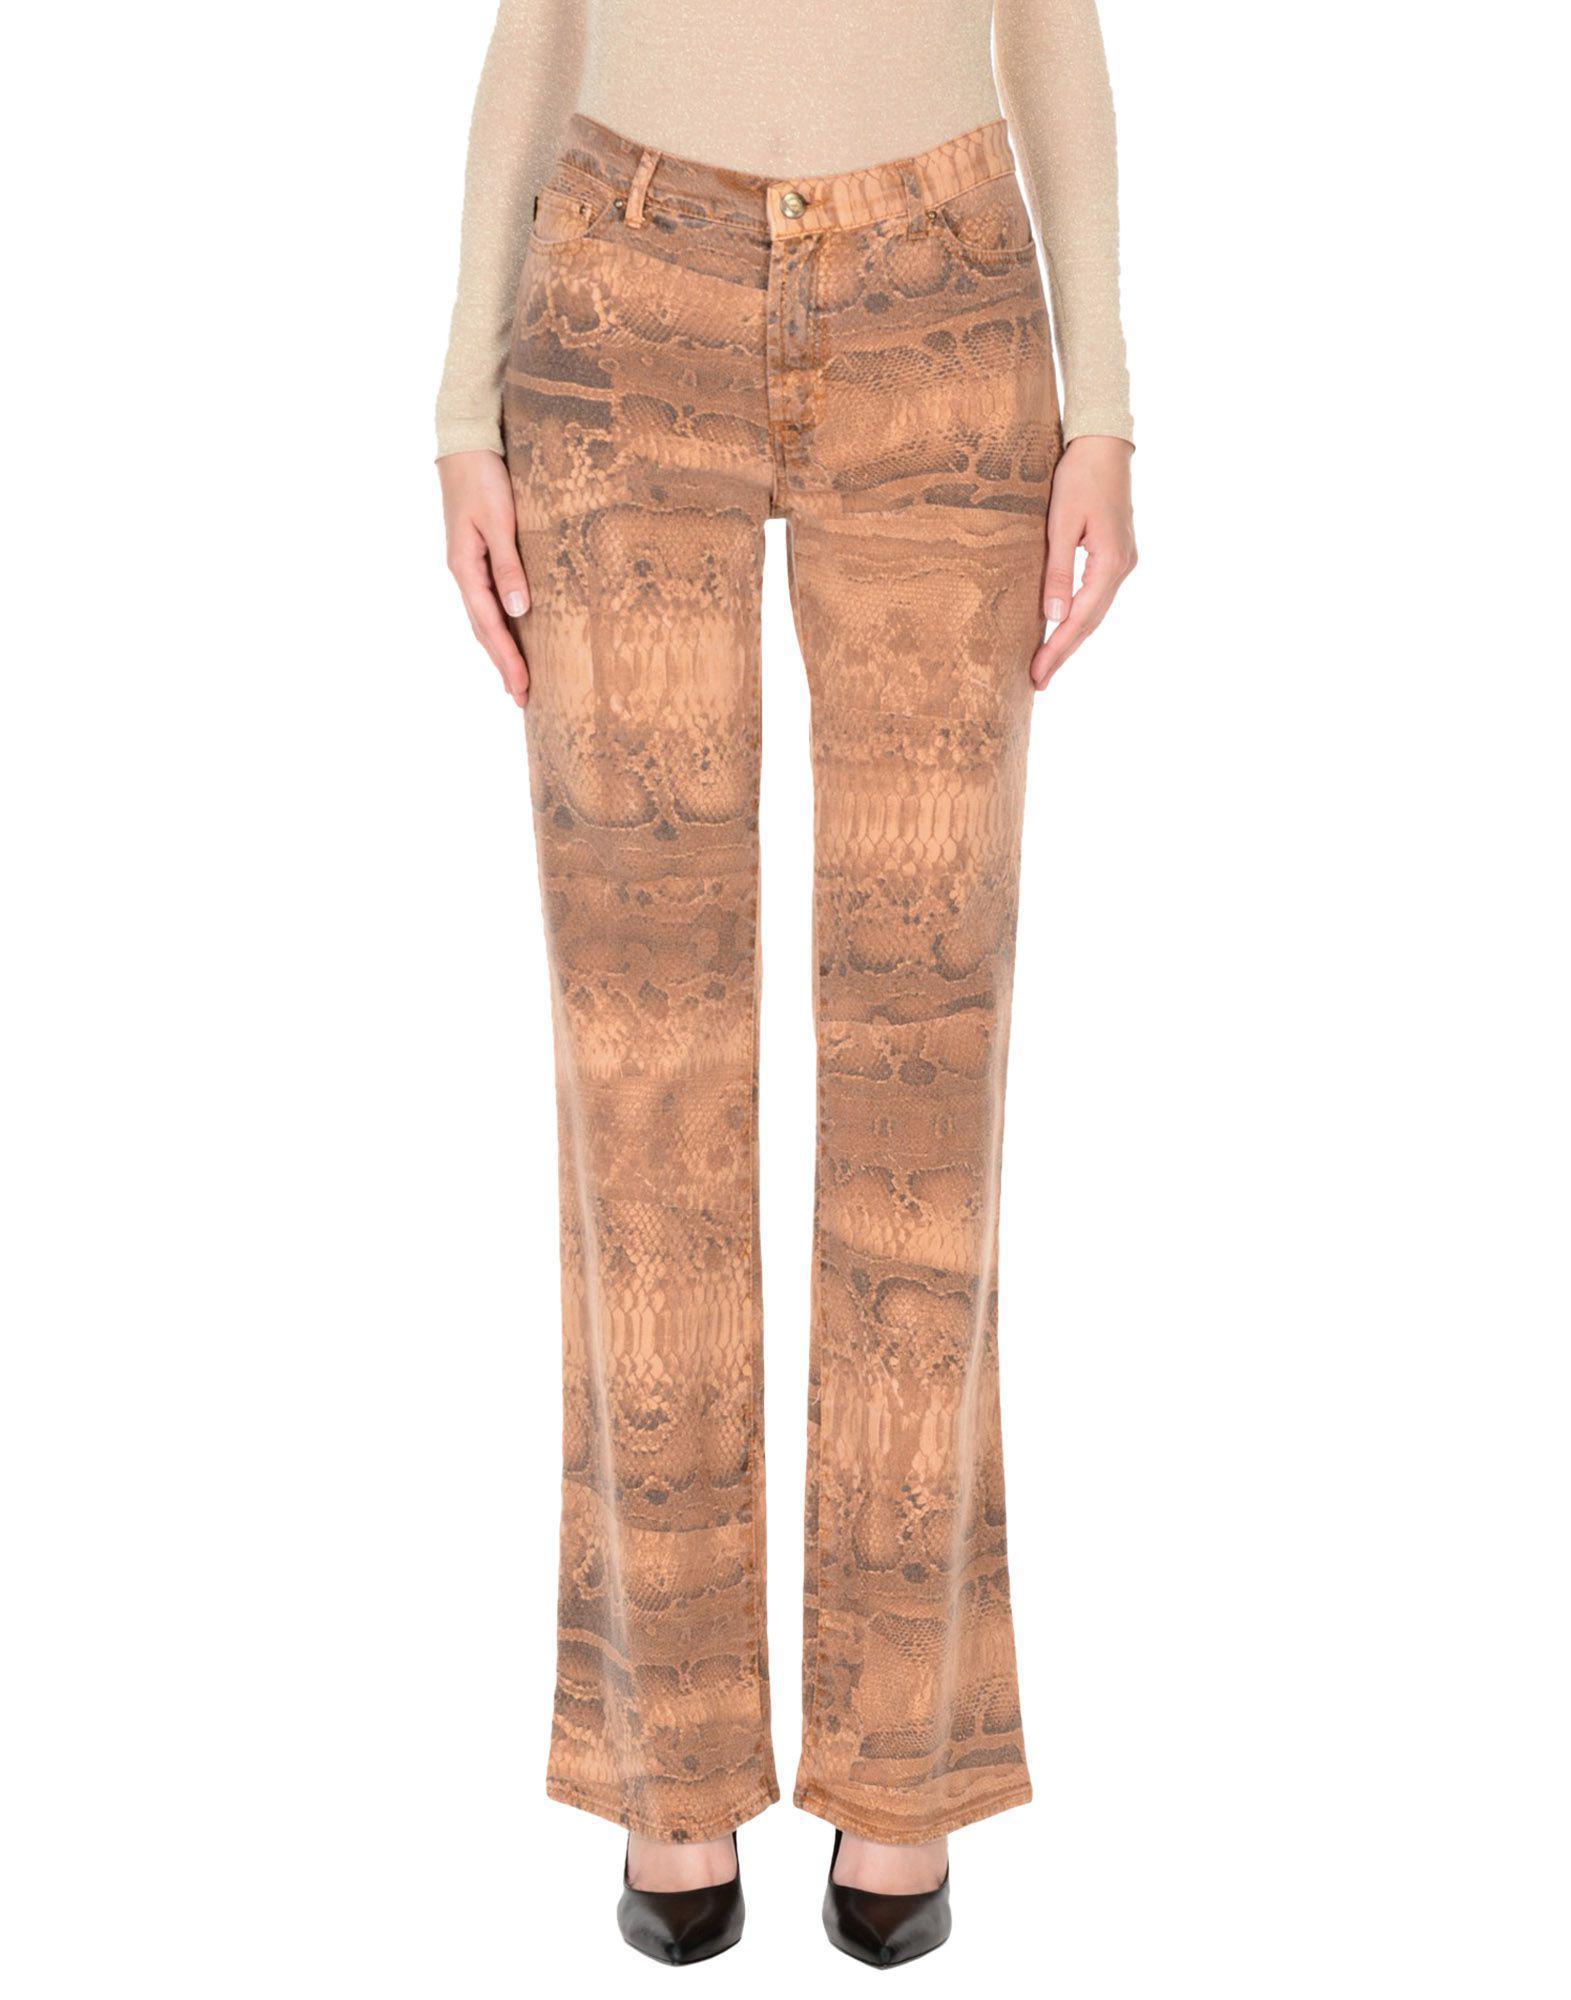 Lyst - Just Cavalli Denim Pants in Brown 09b6c10f2